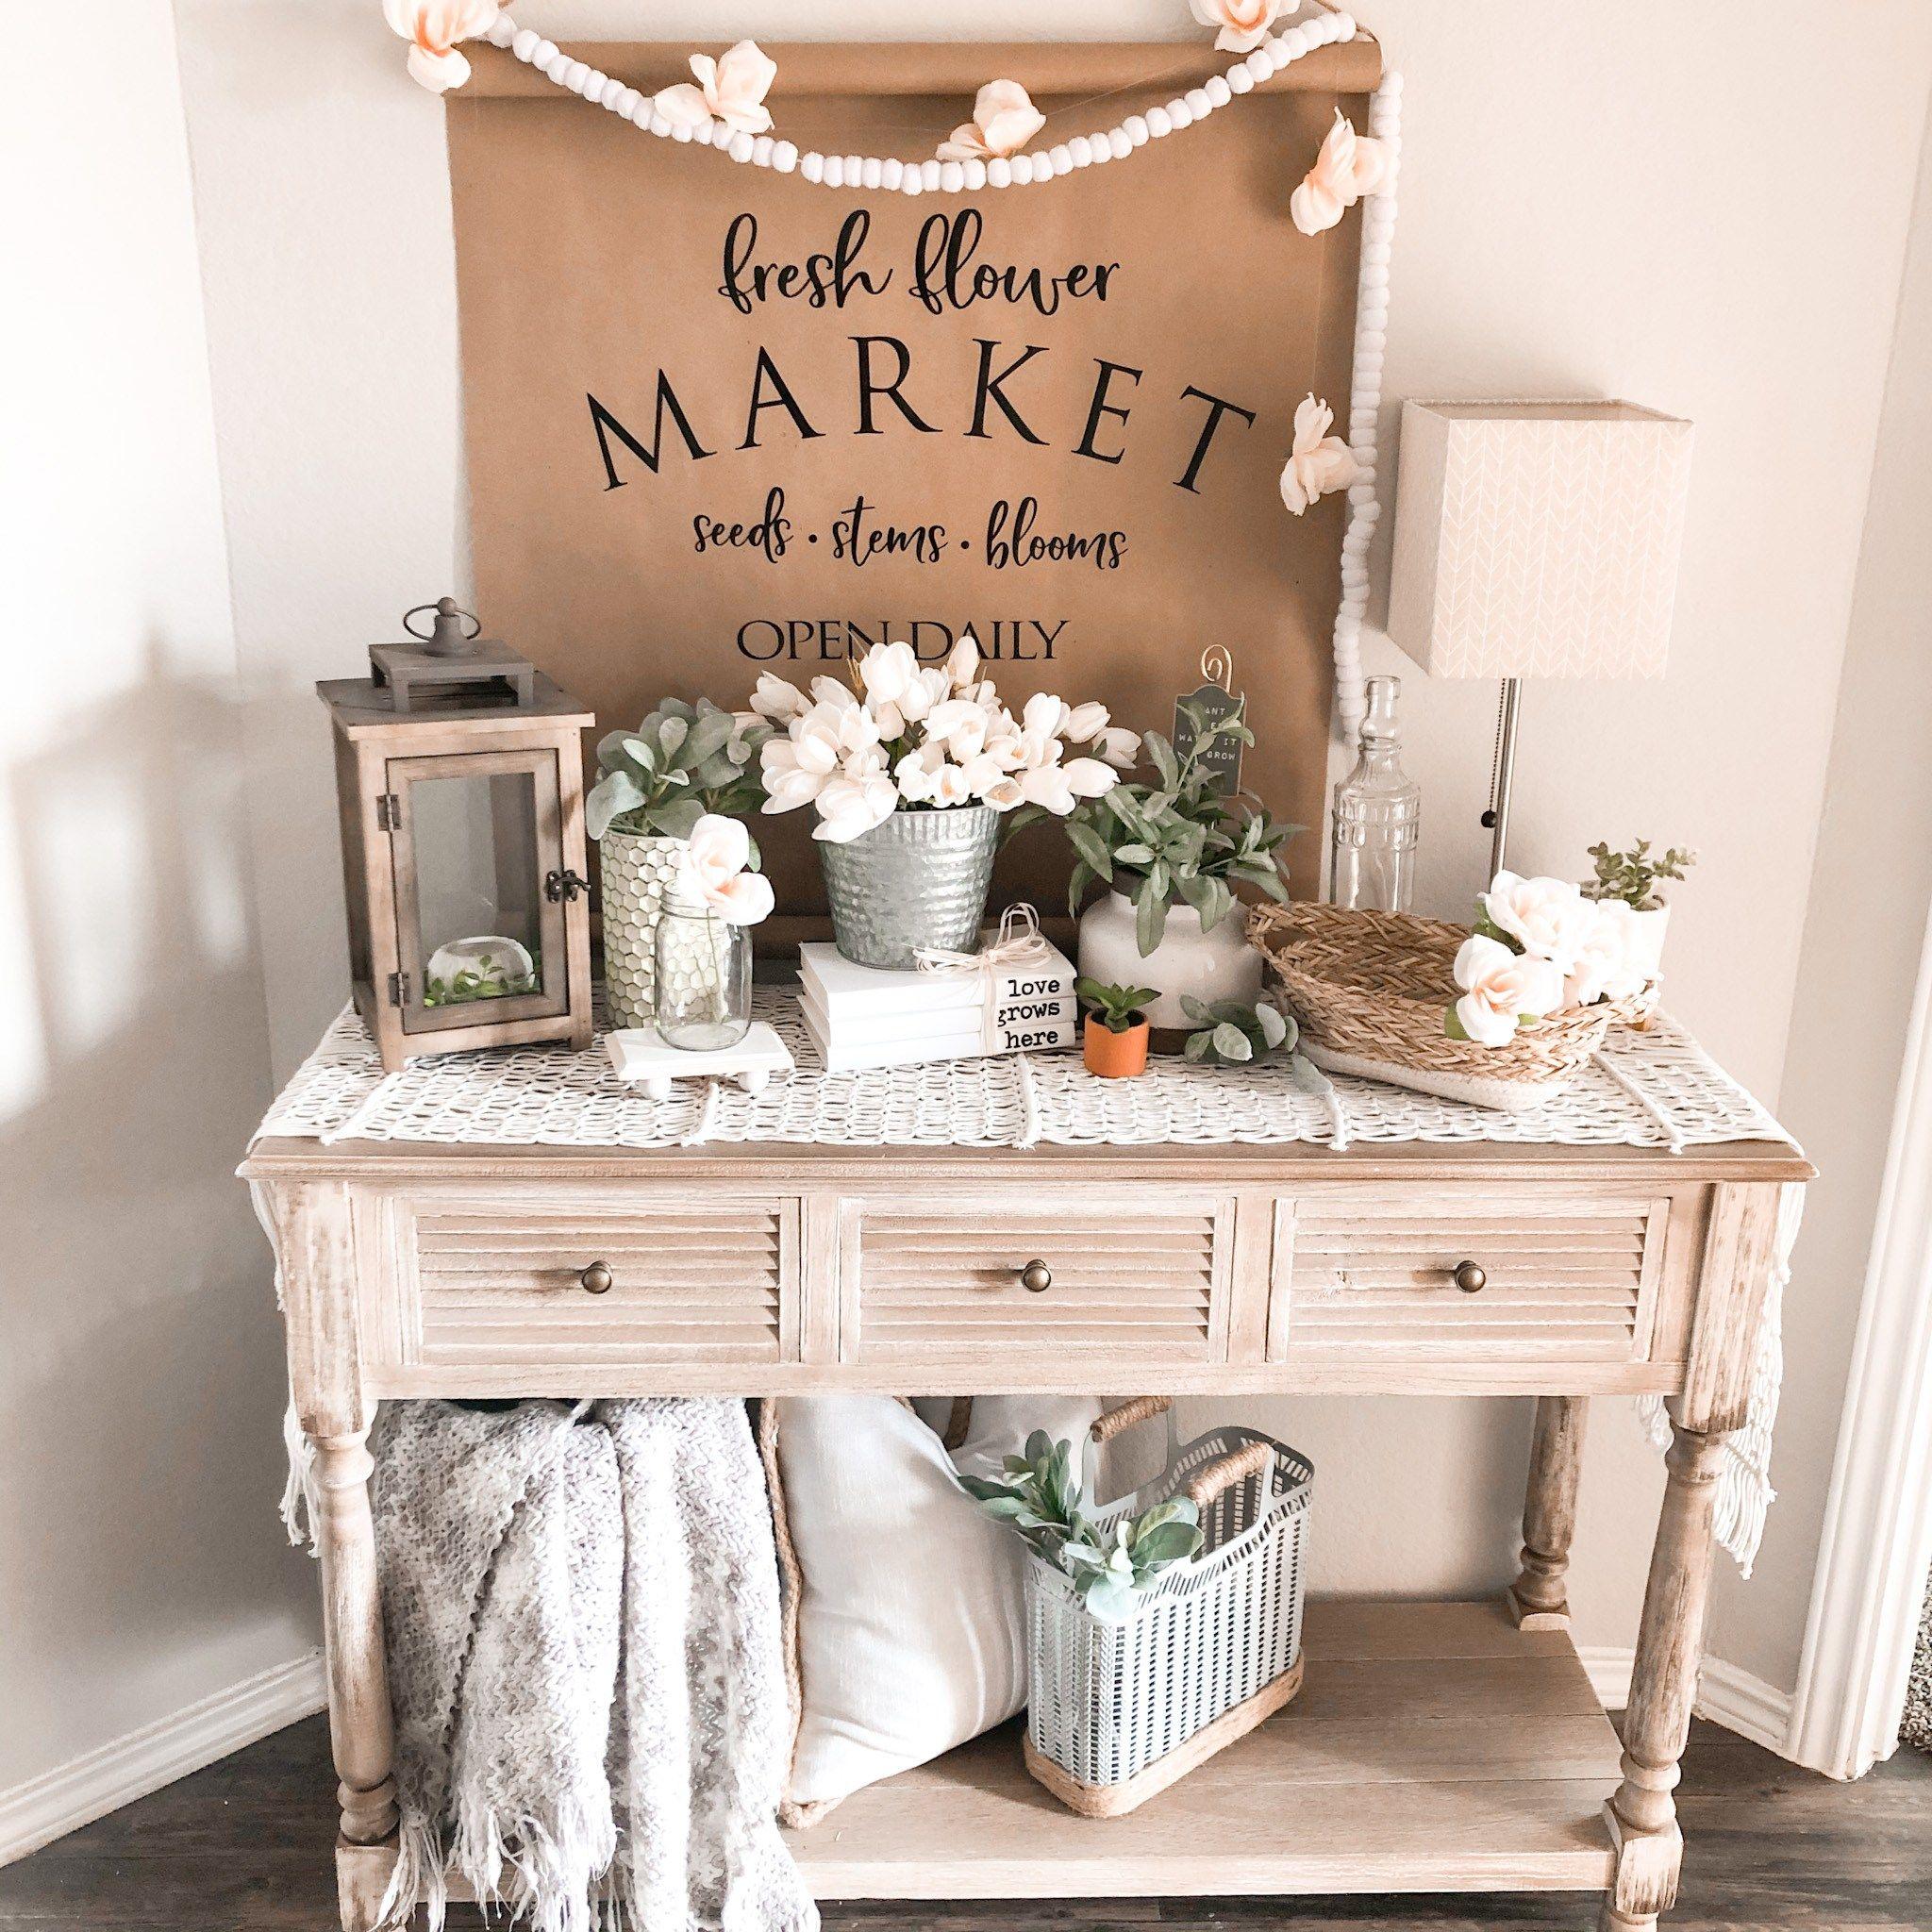 Farmhouse Spring Entryway W/$1 DIY Paper Scroll - Her Happy Home